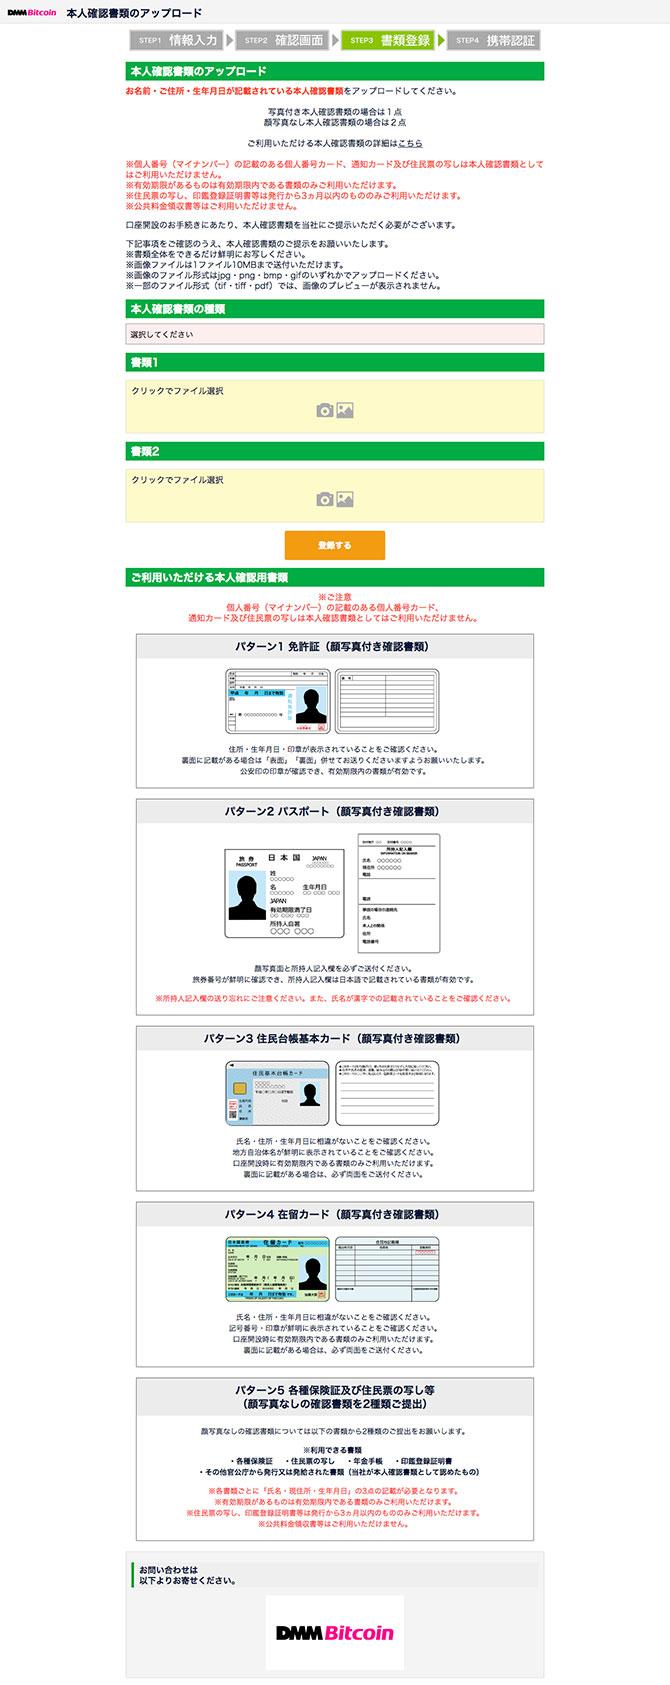 DMM Bitcoin:本人確認書類のアップロード